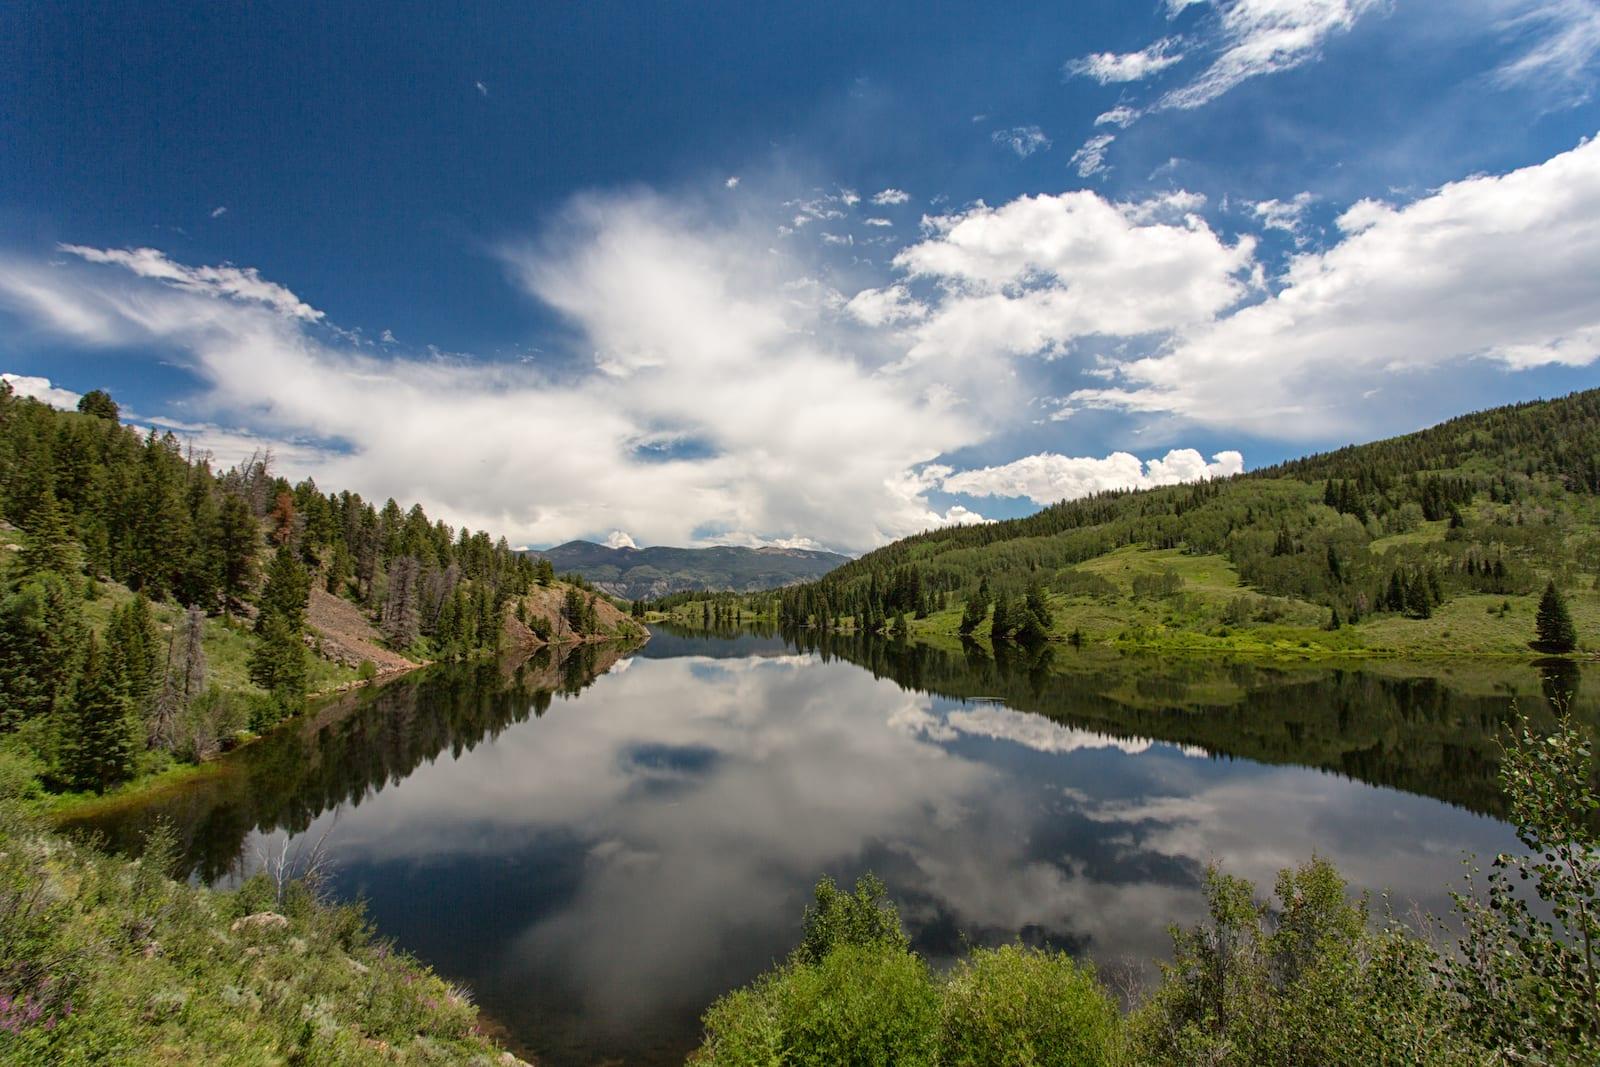 Beautiful hike around Lower Cataract Lake, Summit County, Colorado.